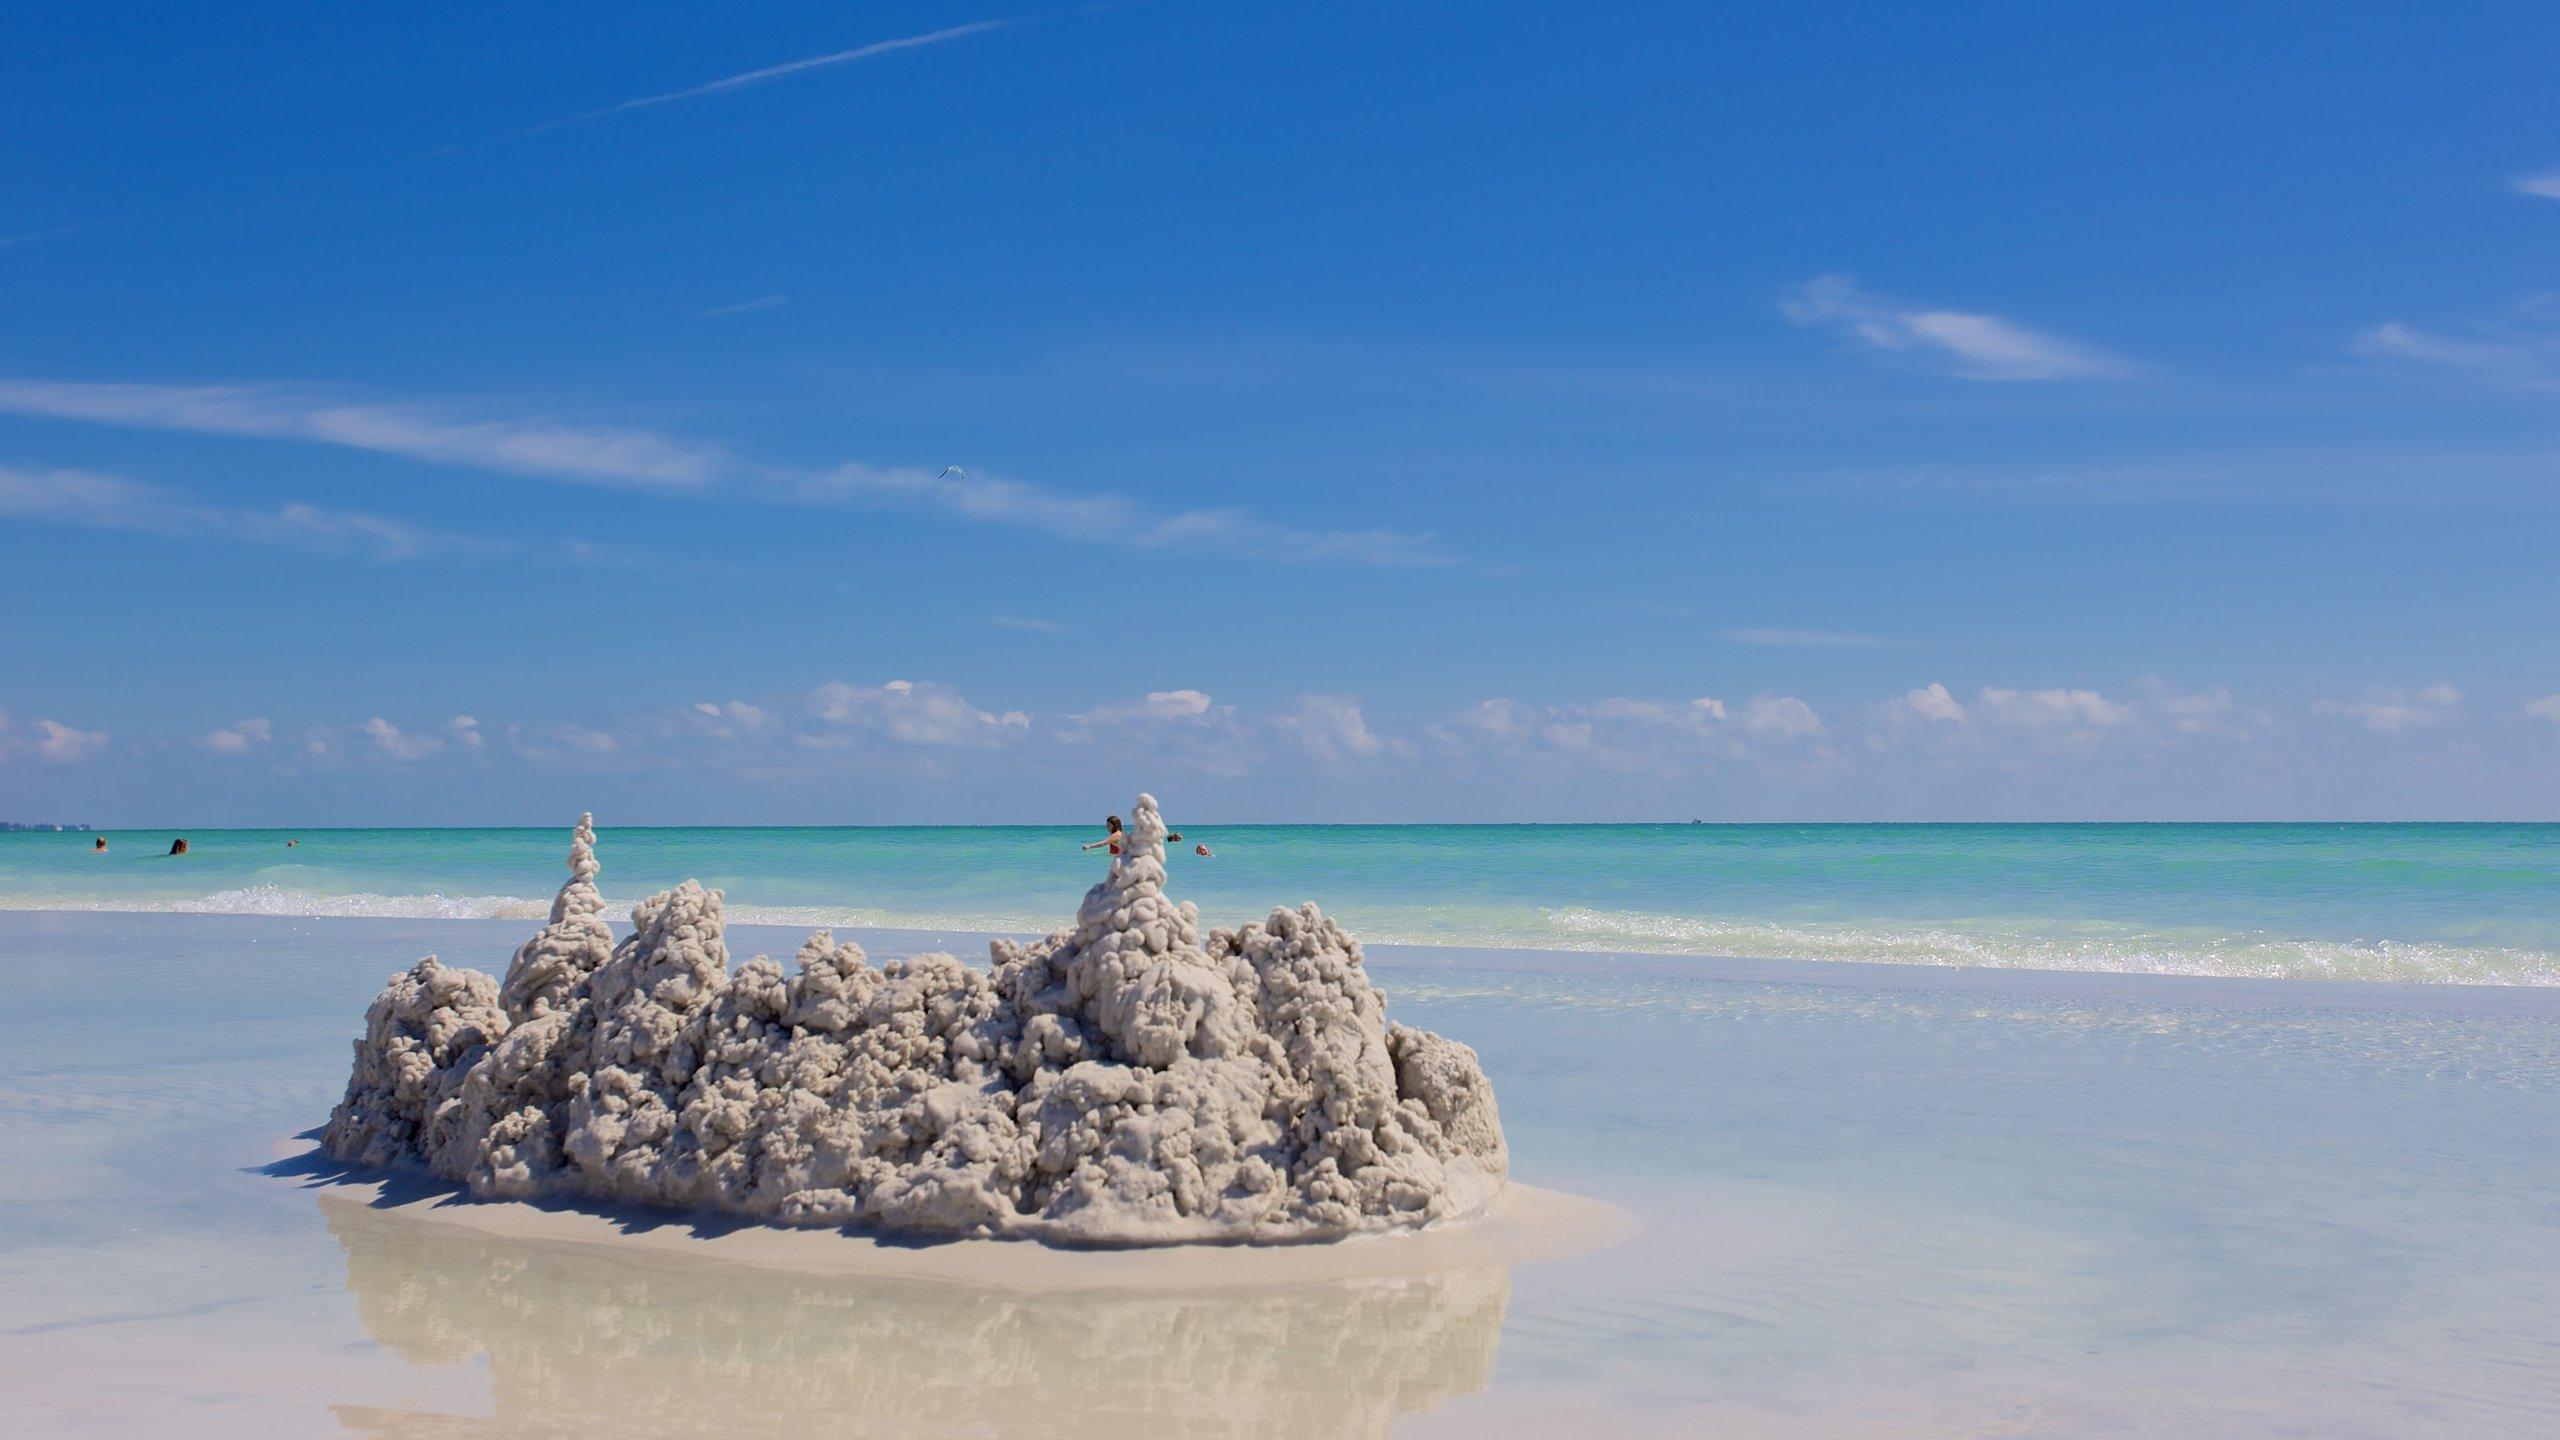 Siesta Key, Florida, United States of America